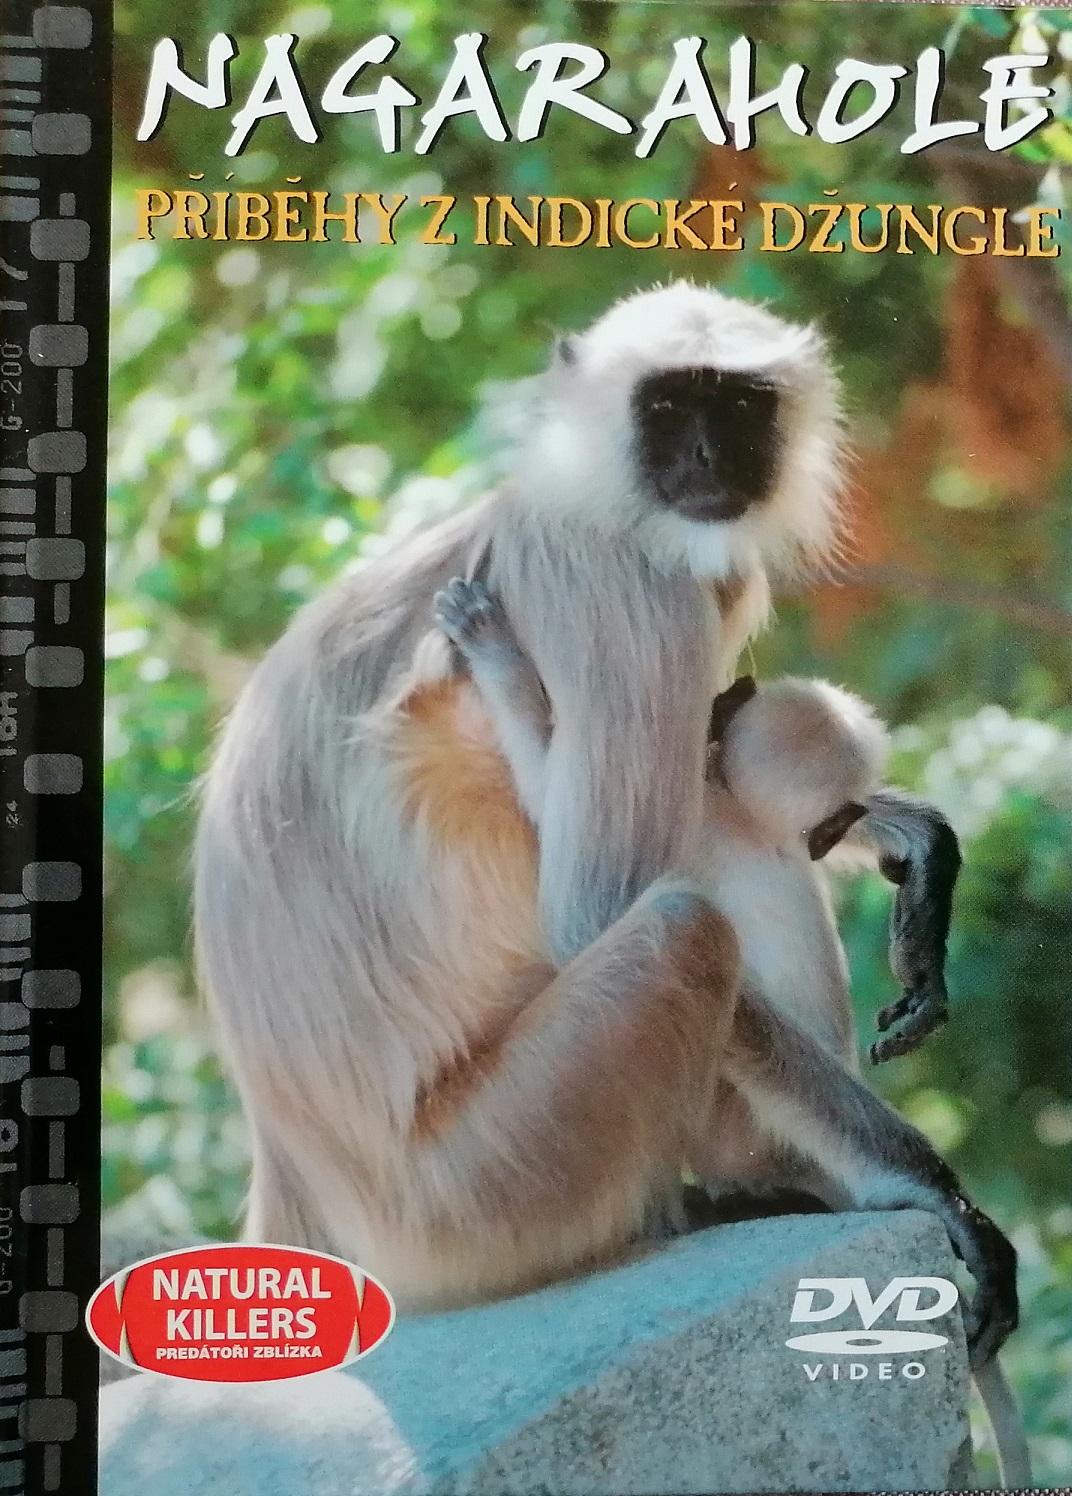 Nagarahole - Příběhy z indické džungle - DVD + brožura